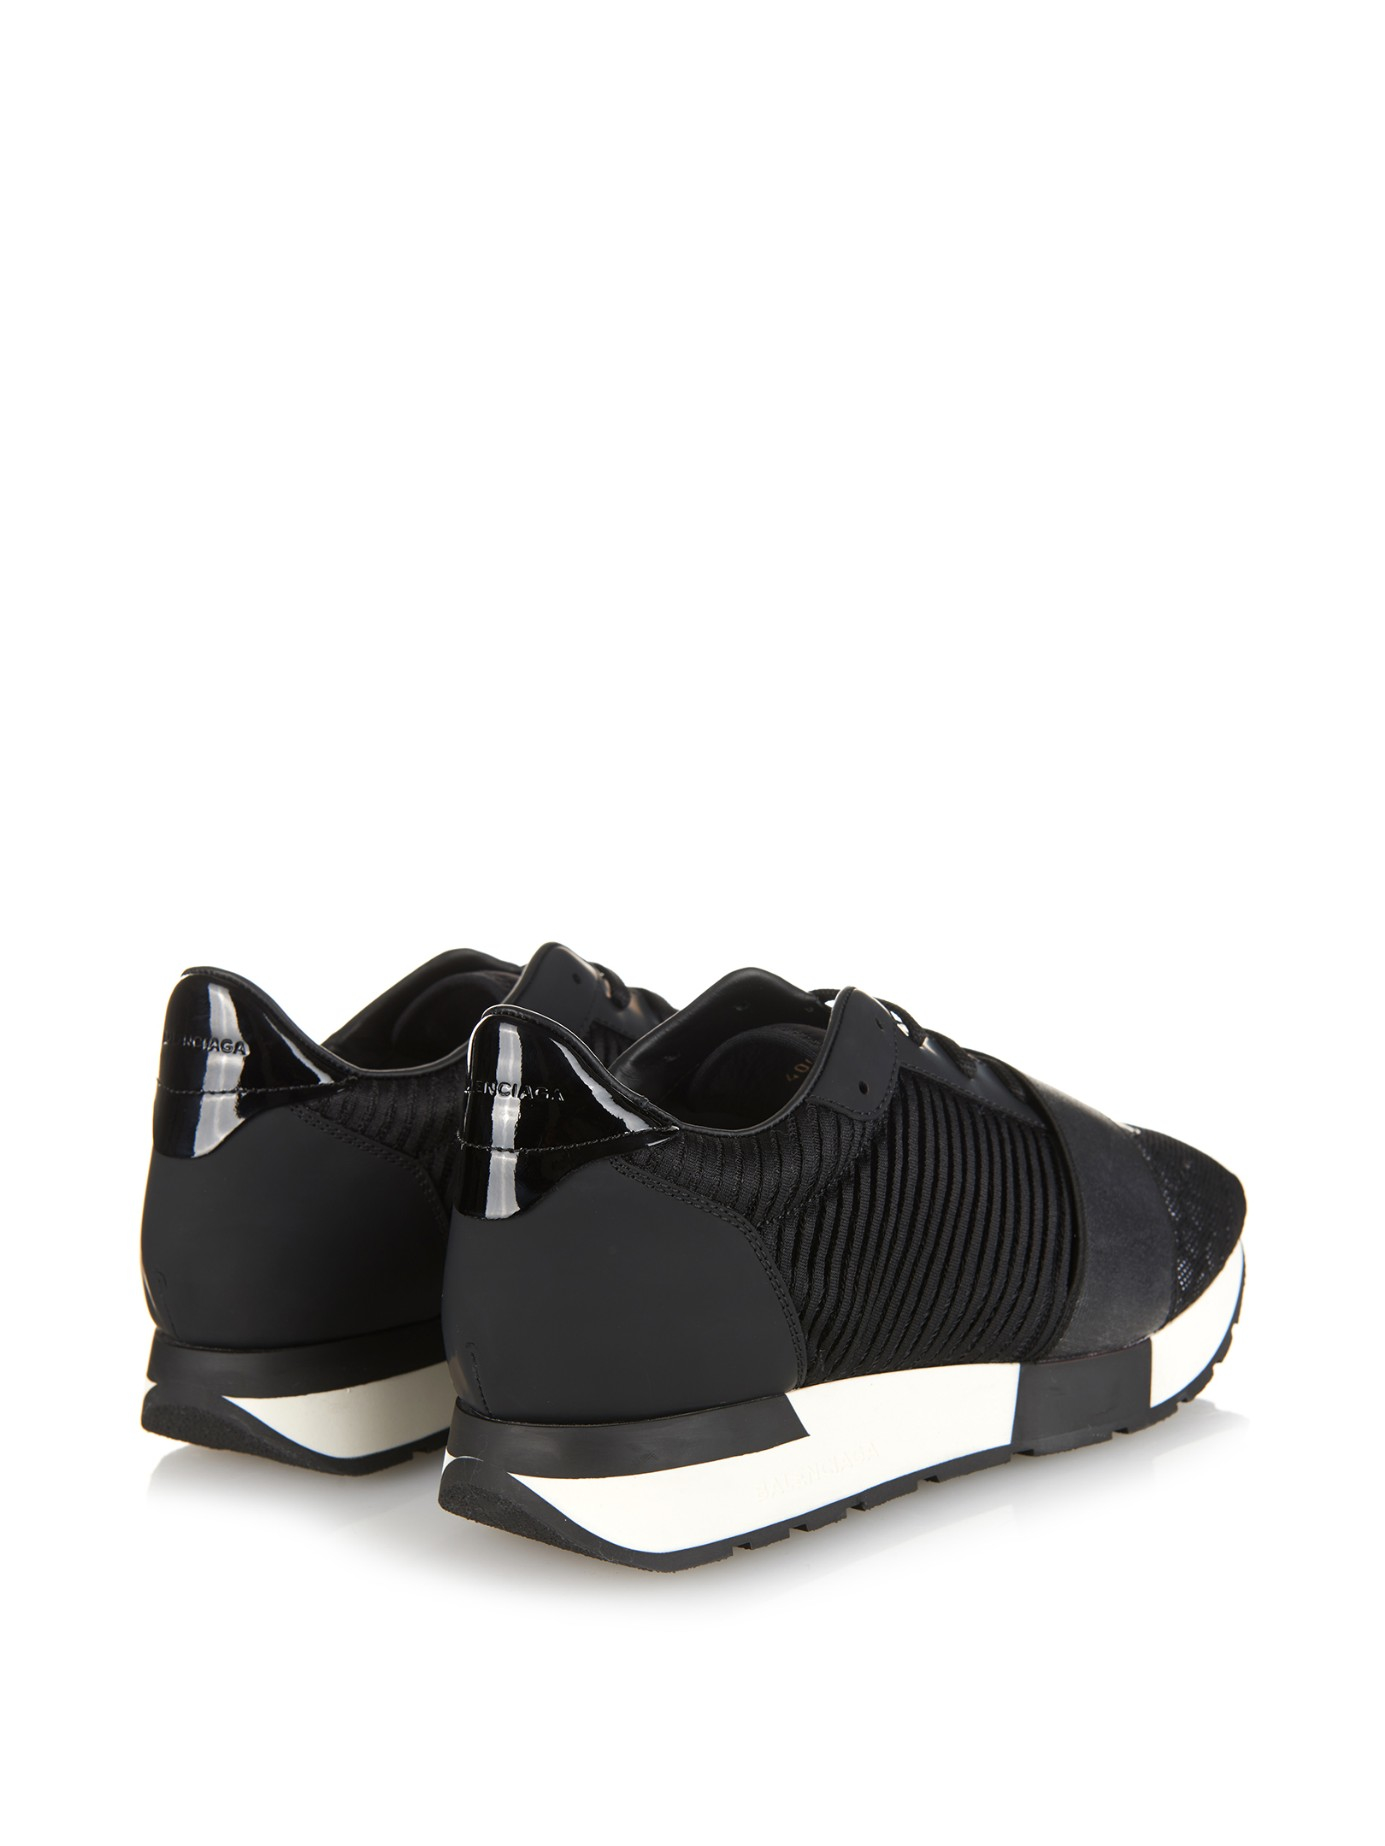 Black Reebok Shoes For Women